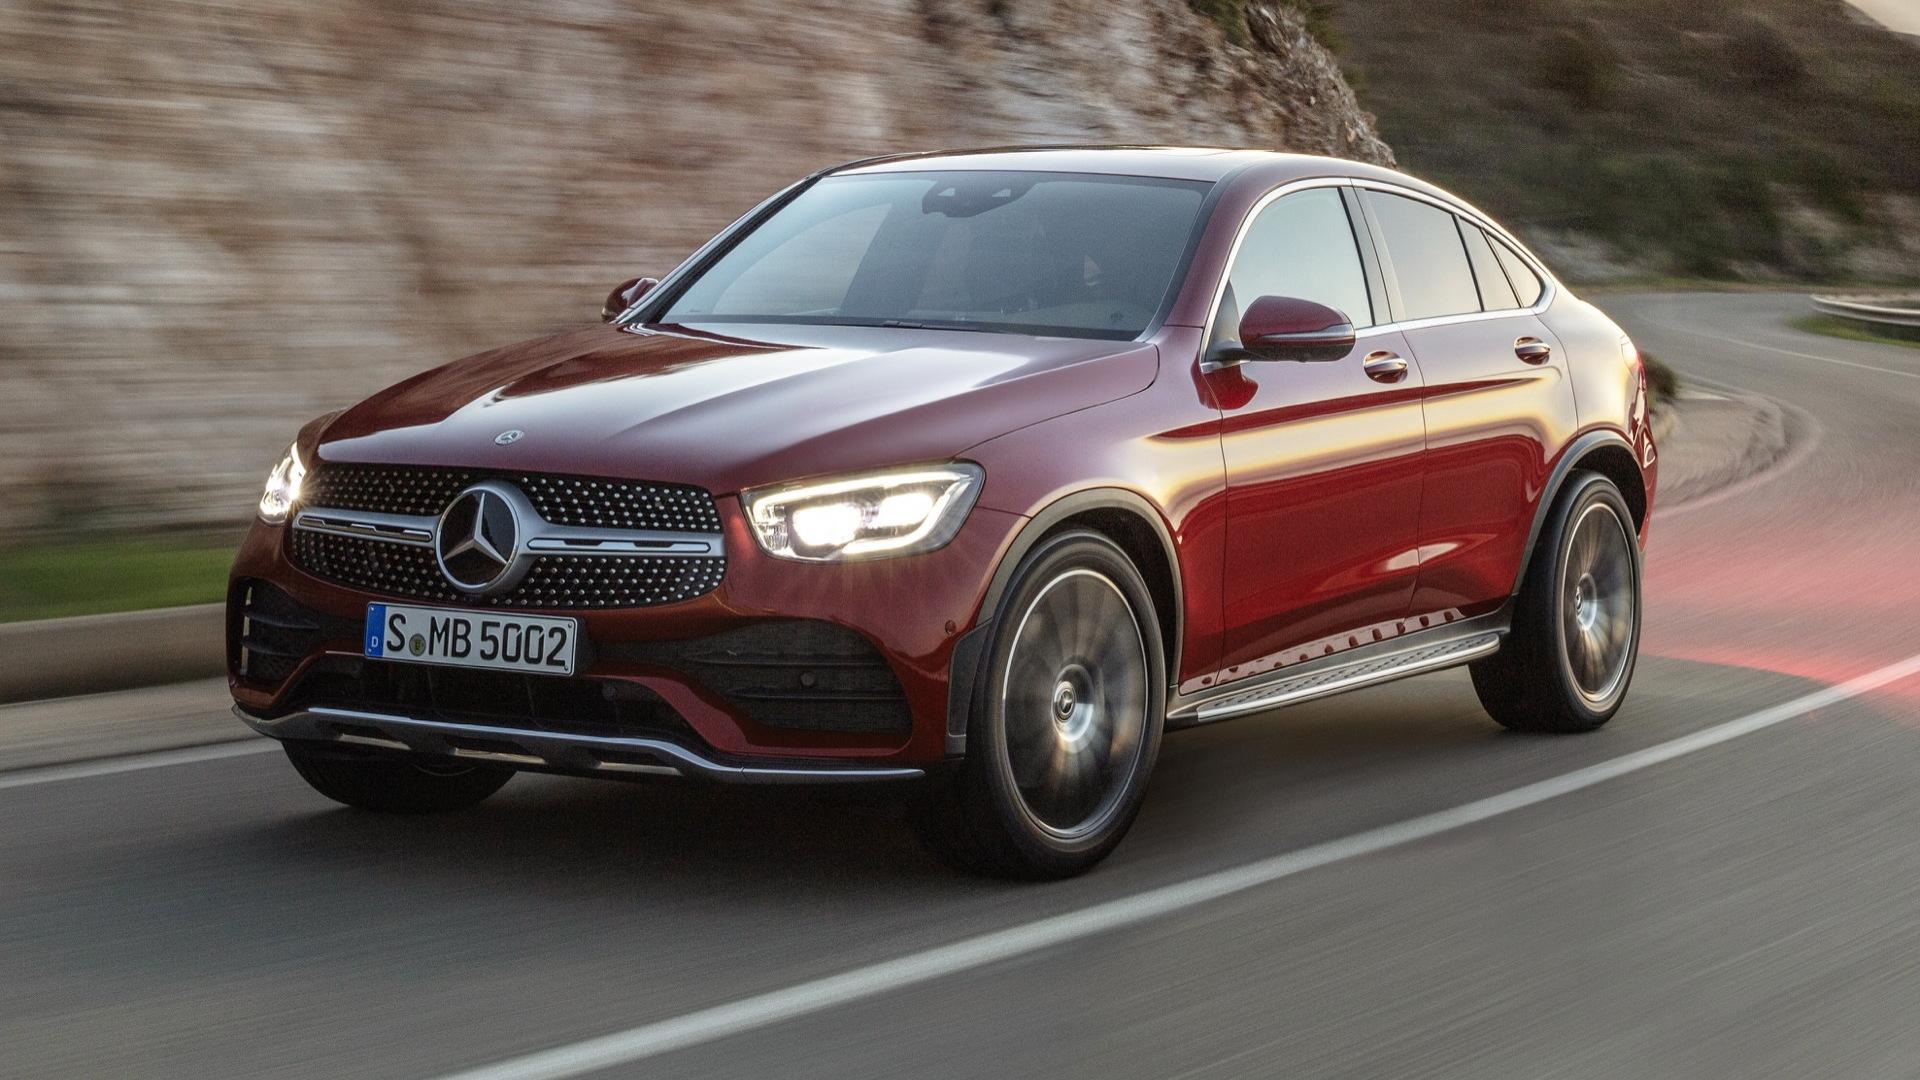 2020 Mercedes-Benz GLC-Class Coupe